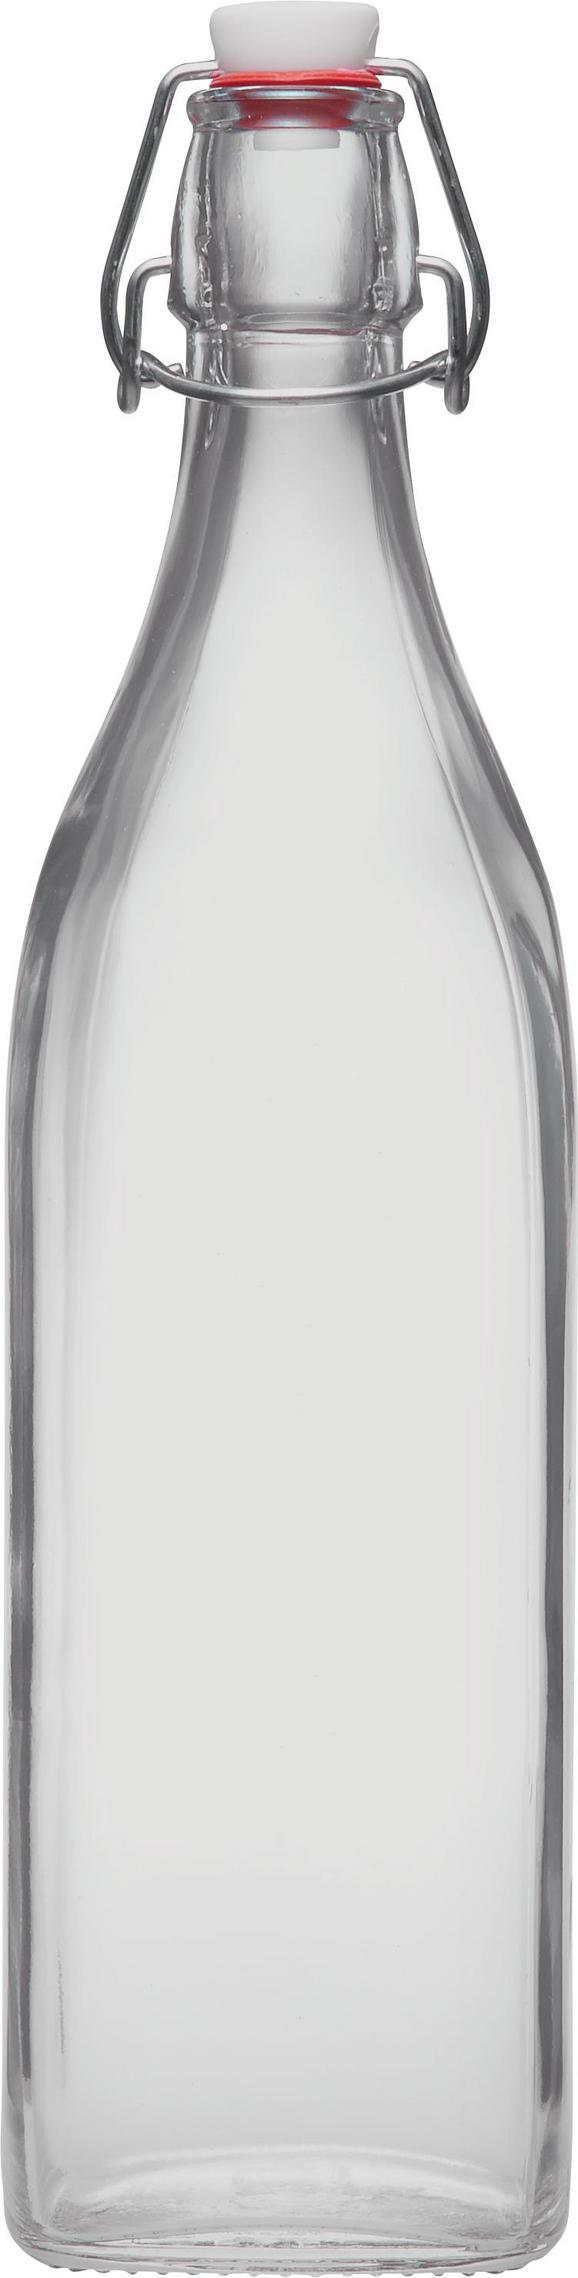 Universalflasche Swing aus Glas, ca. 0,25l - Klar, Glas (0,25l) - Mömax modern living